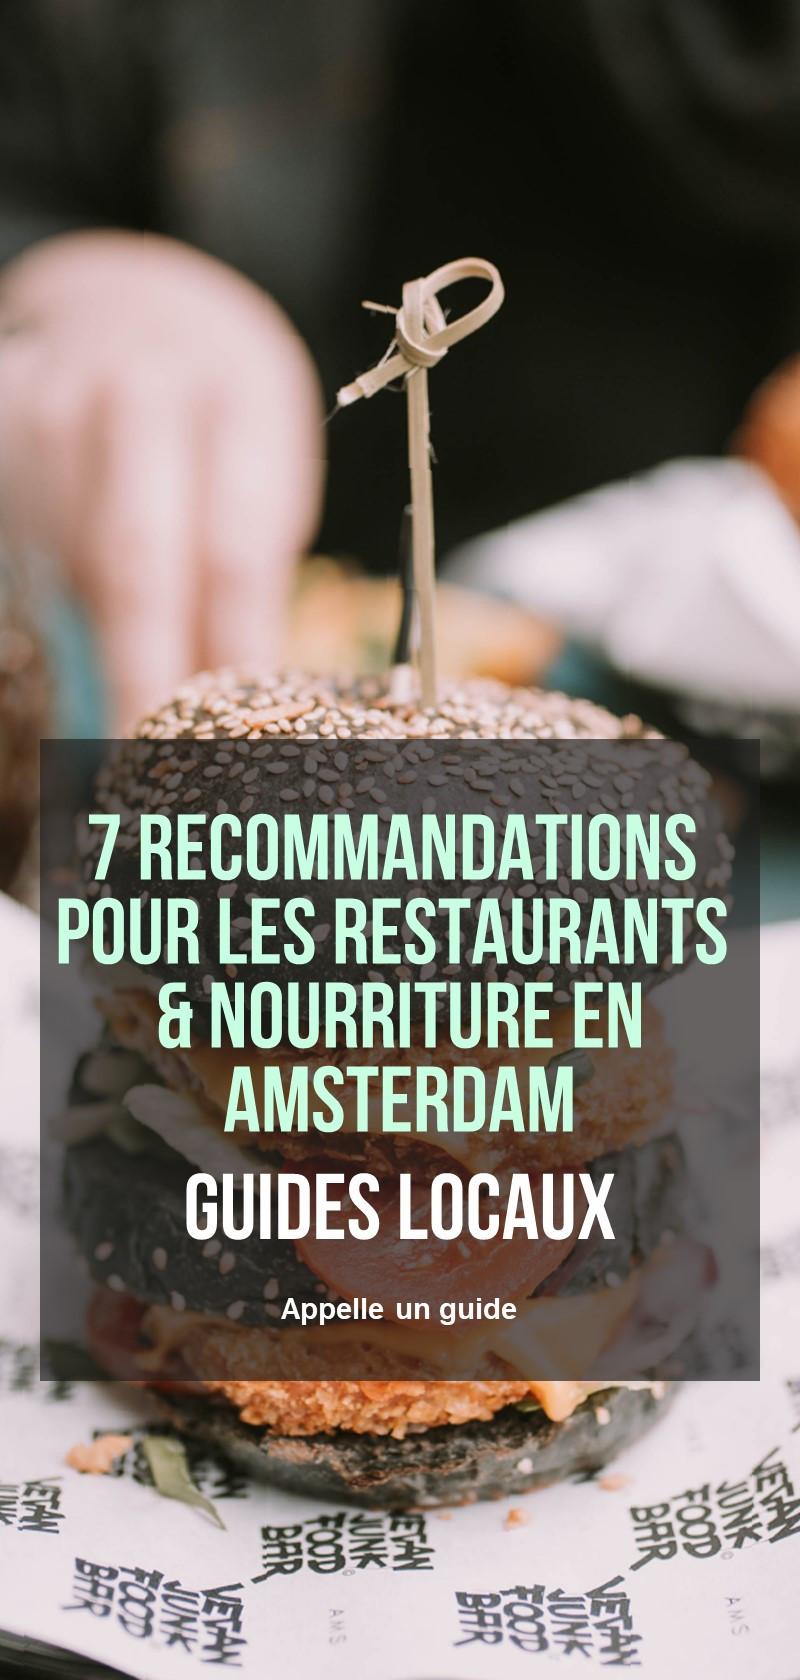 Restaurants et nourriture à Amsterdam